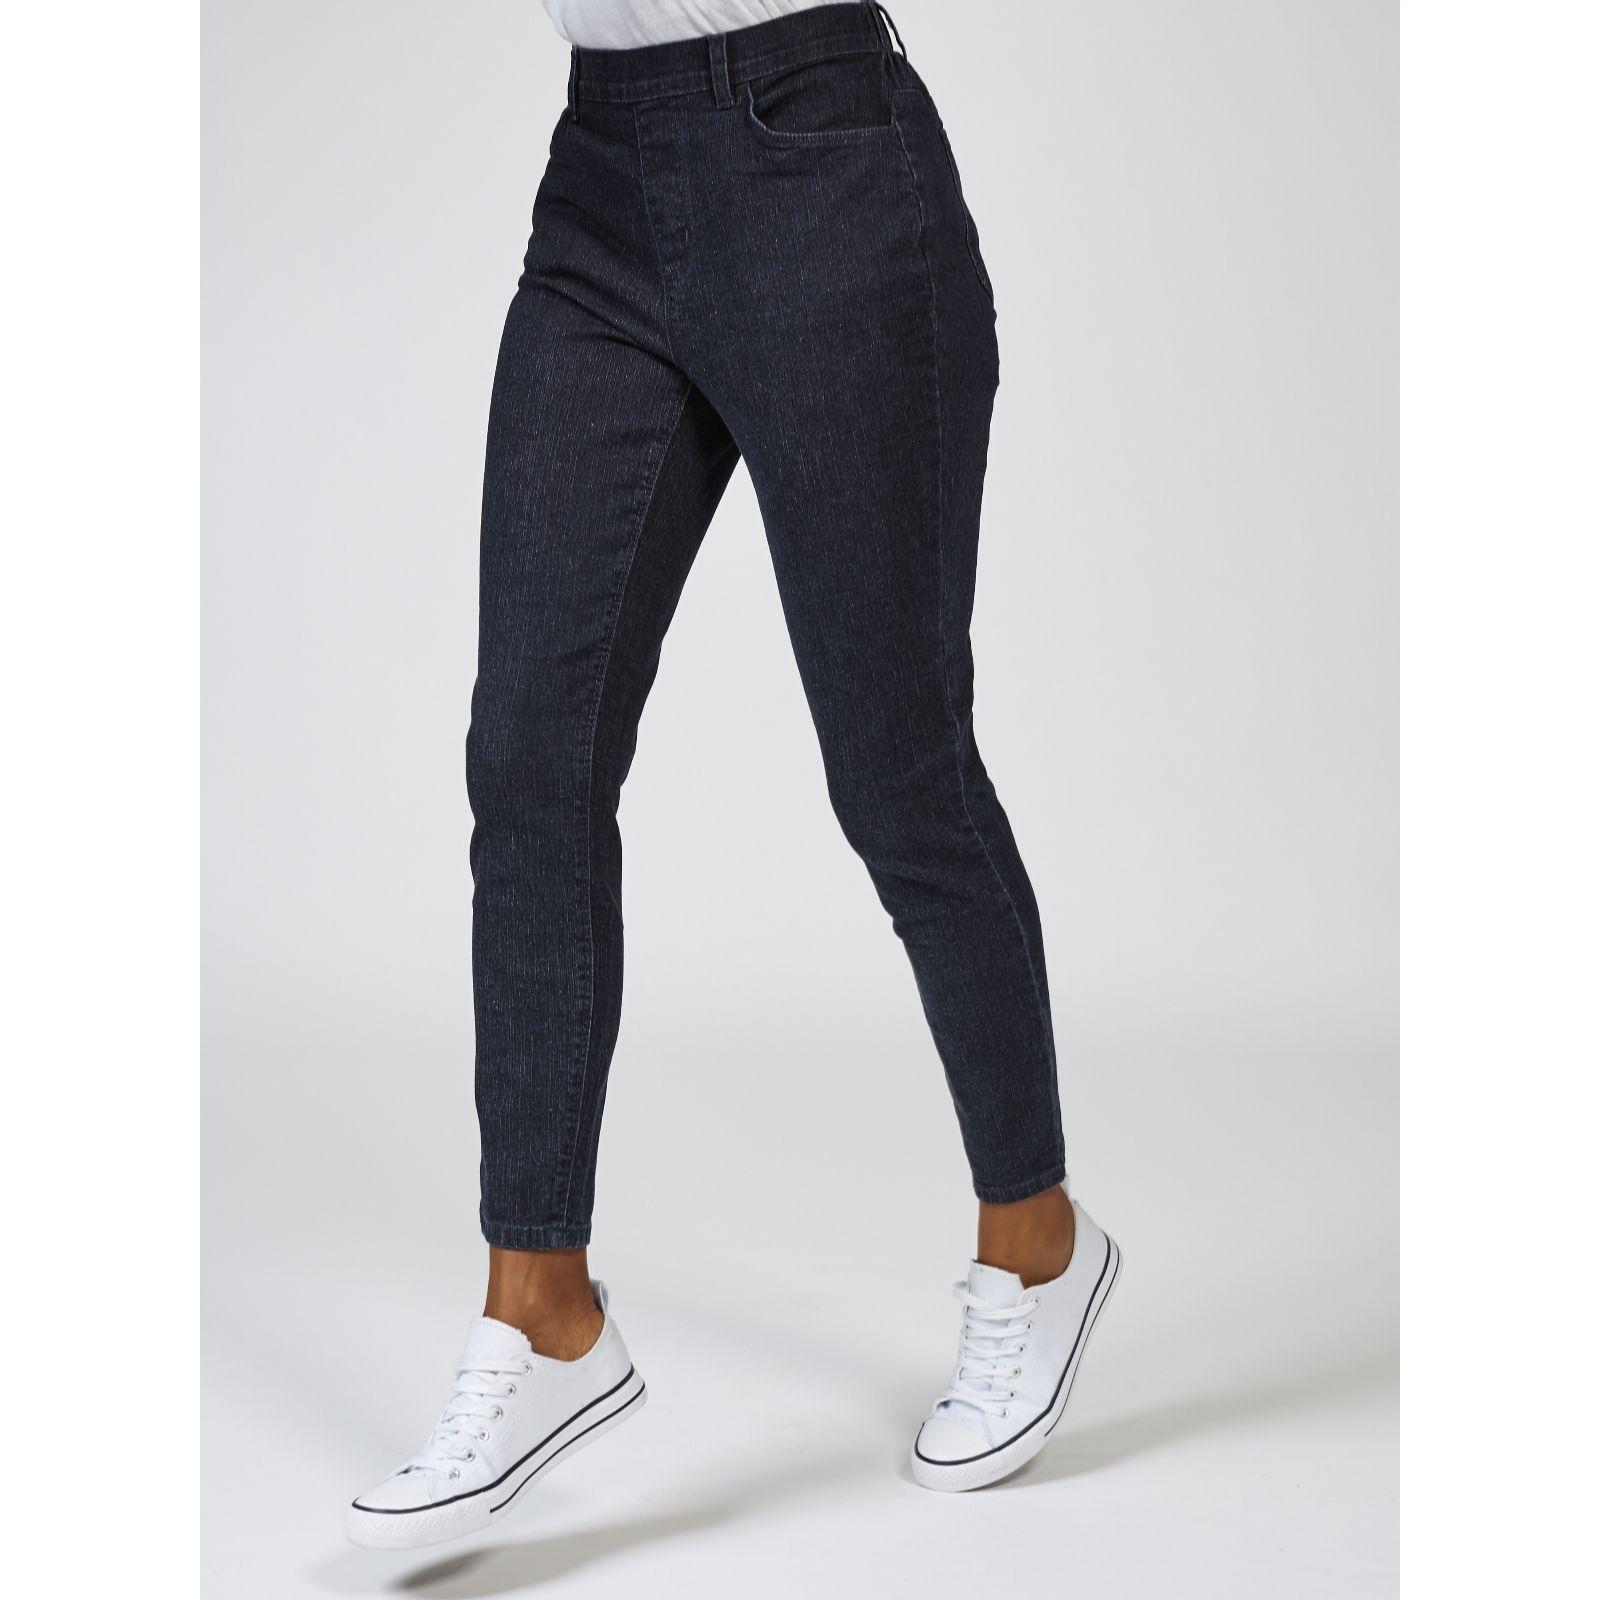 bab5e96cf42 Denim   Co. Classic Waist Stretch Skinny Jeans Petite - QVC UK